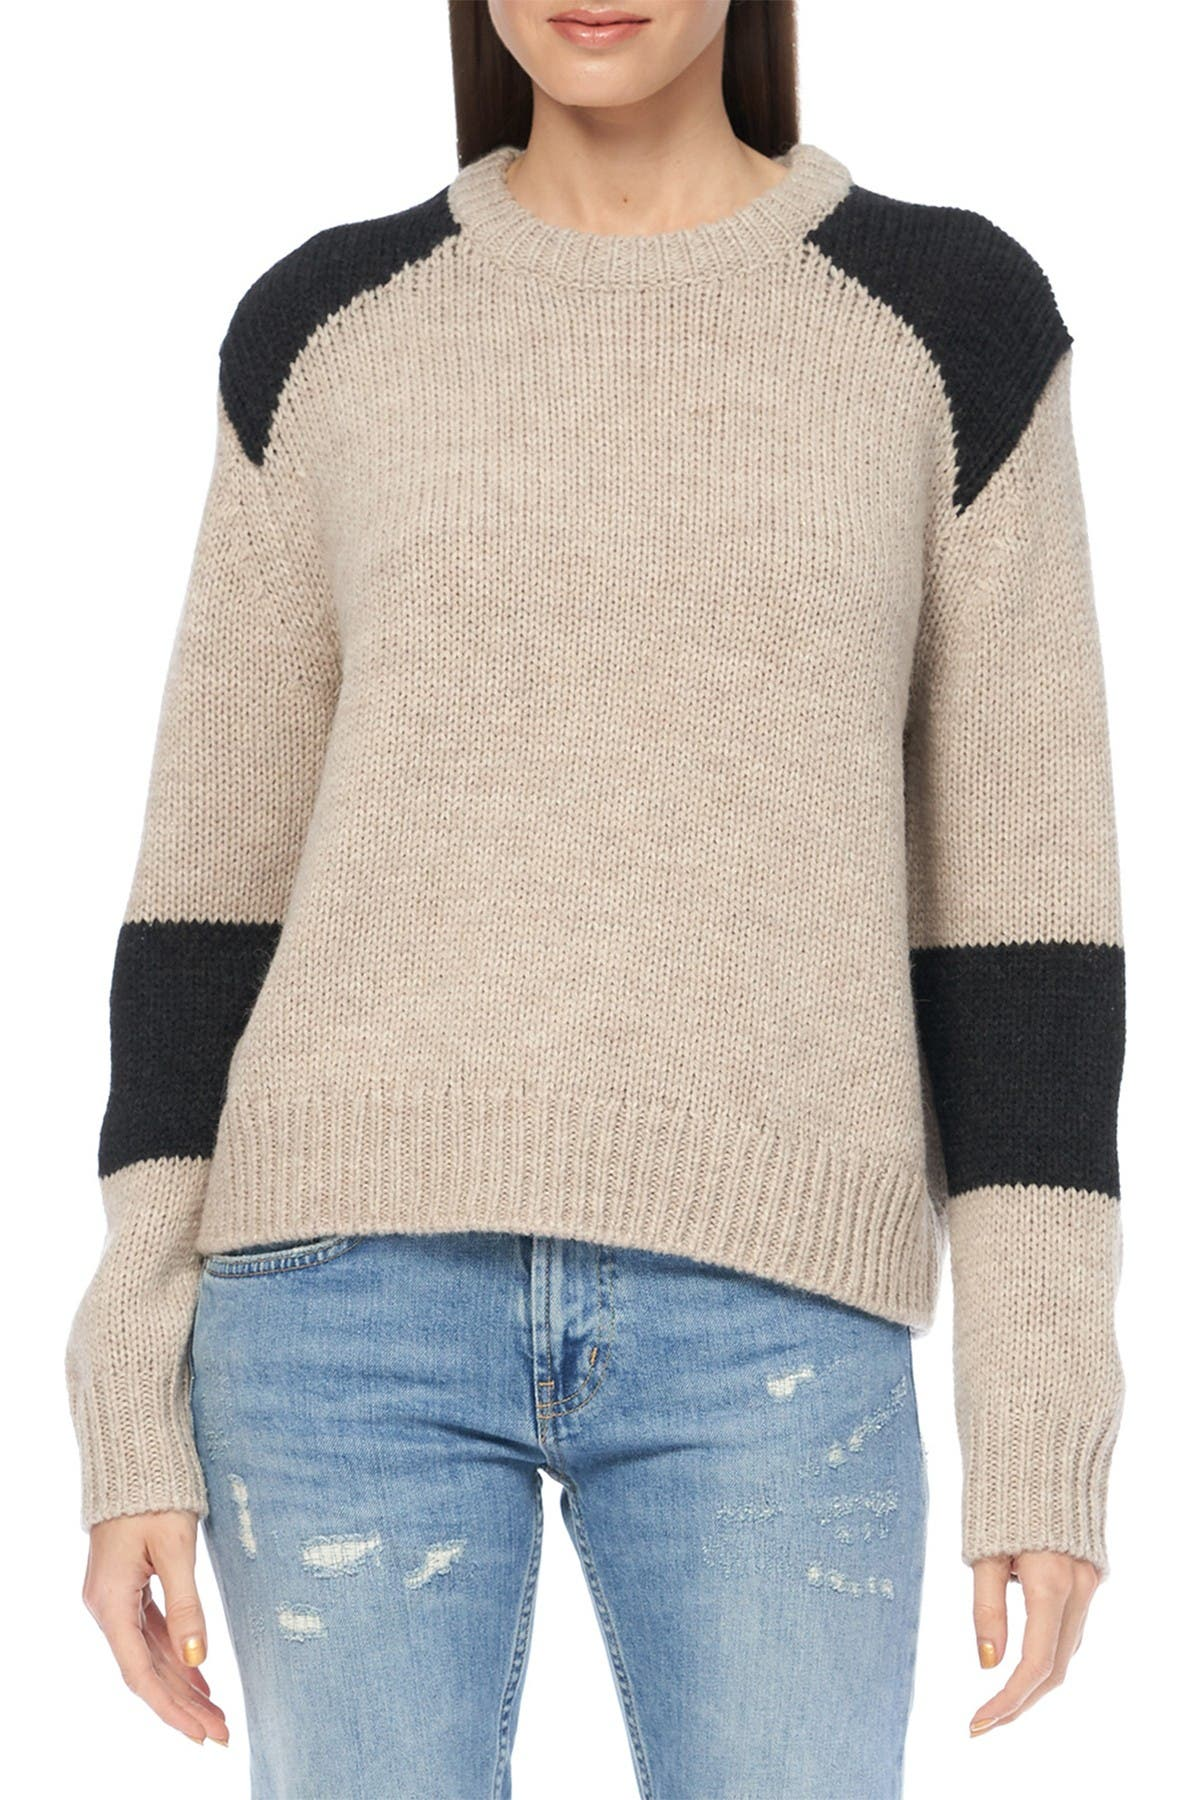 Image of 360 Cashmere Juliana Colorblock Crew Neck Sweater